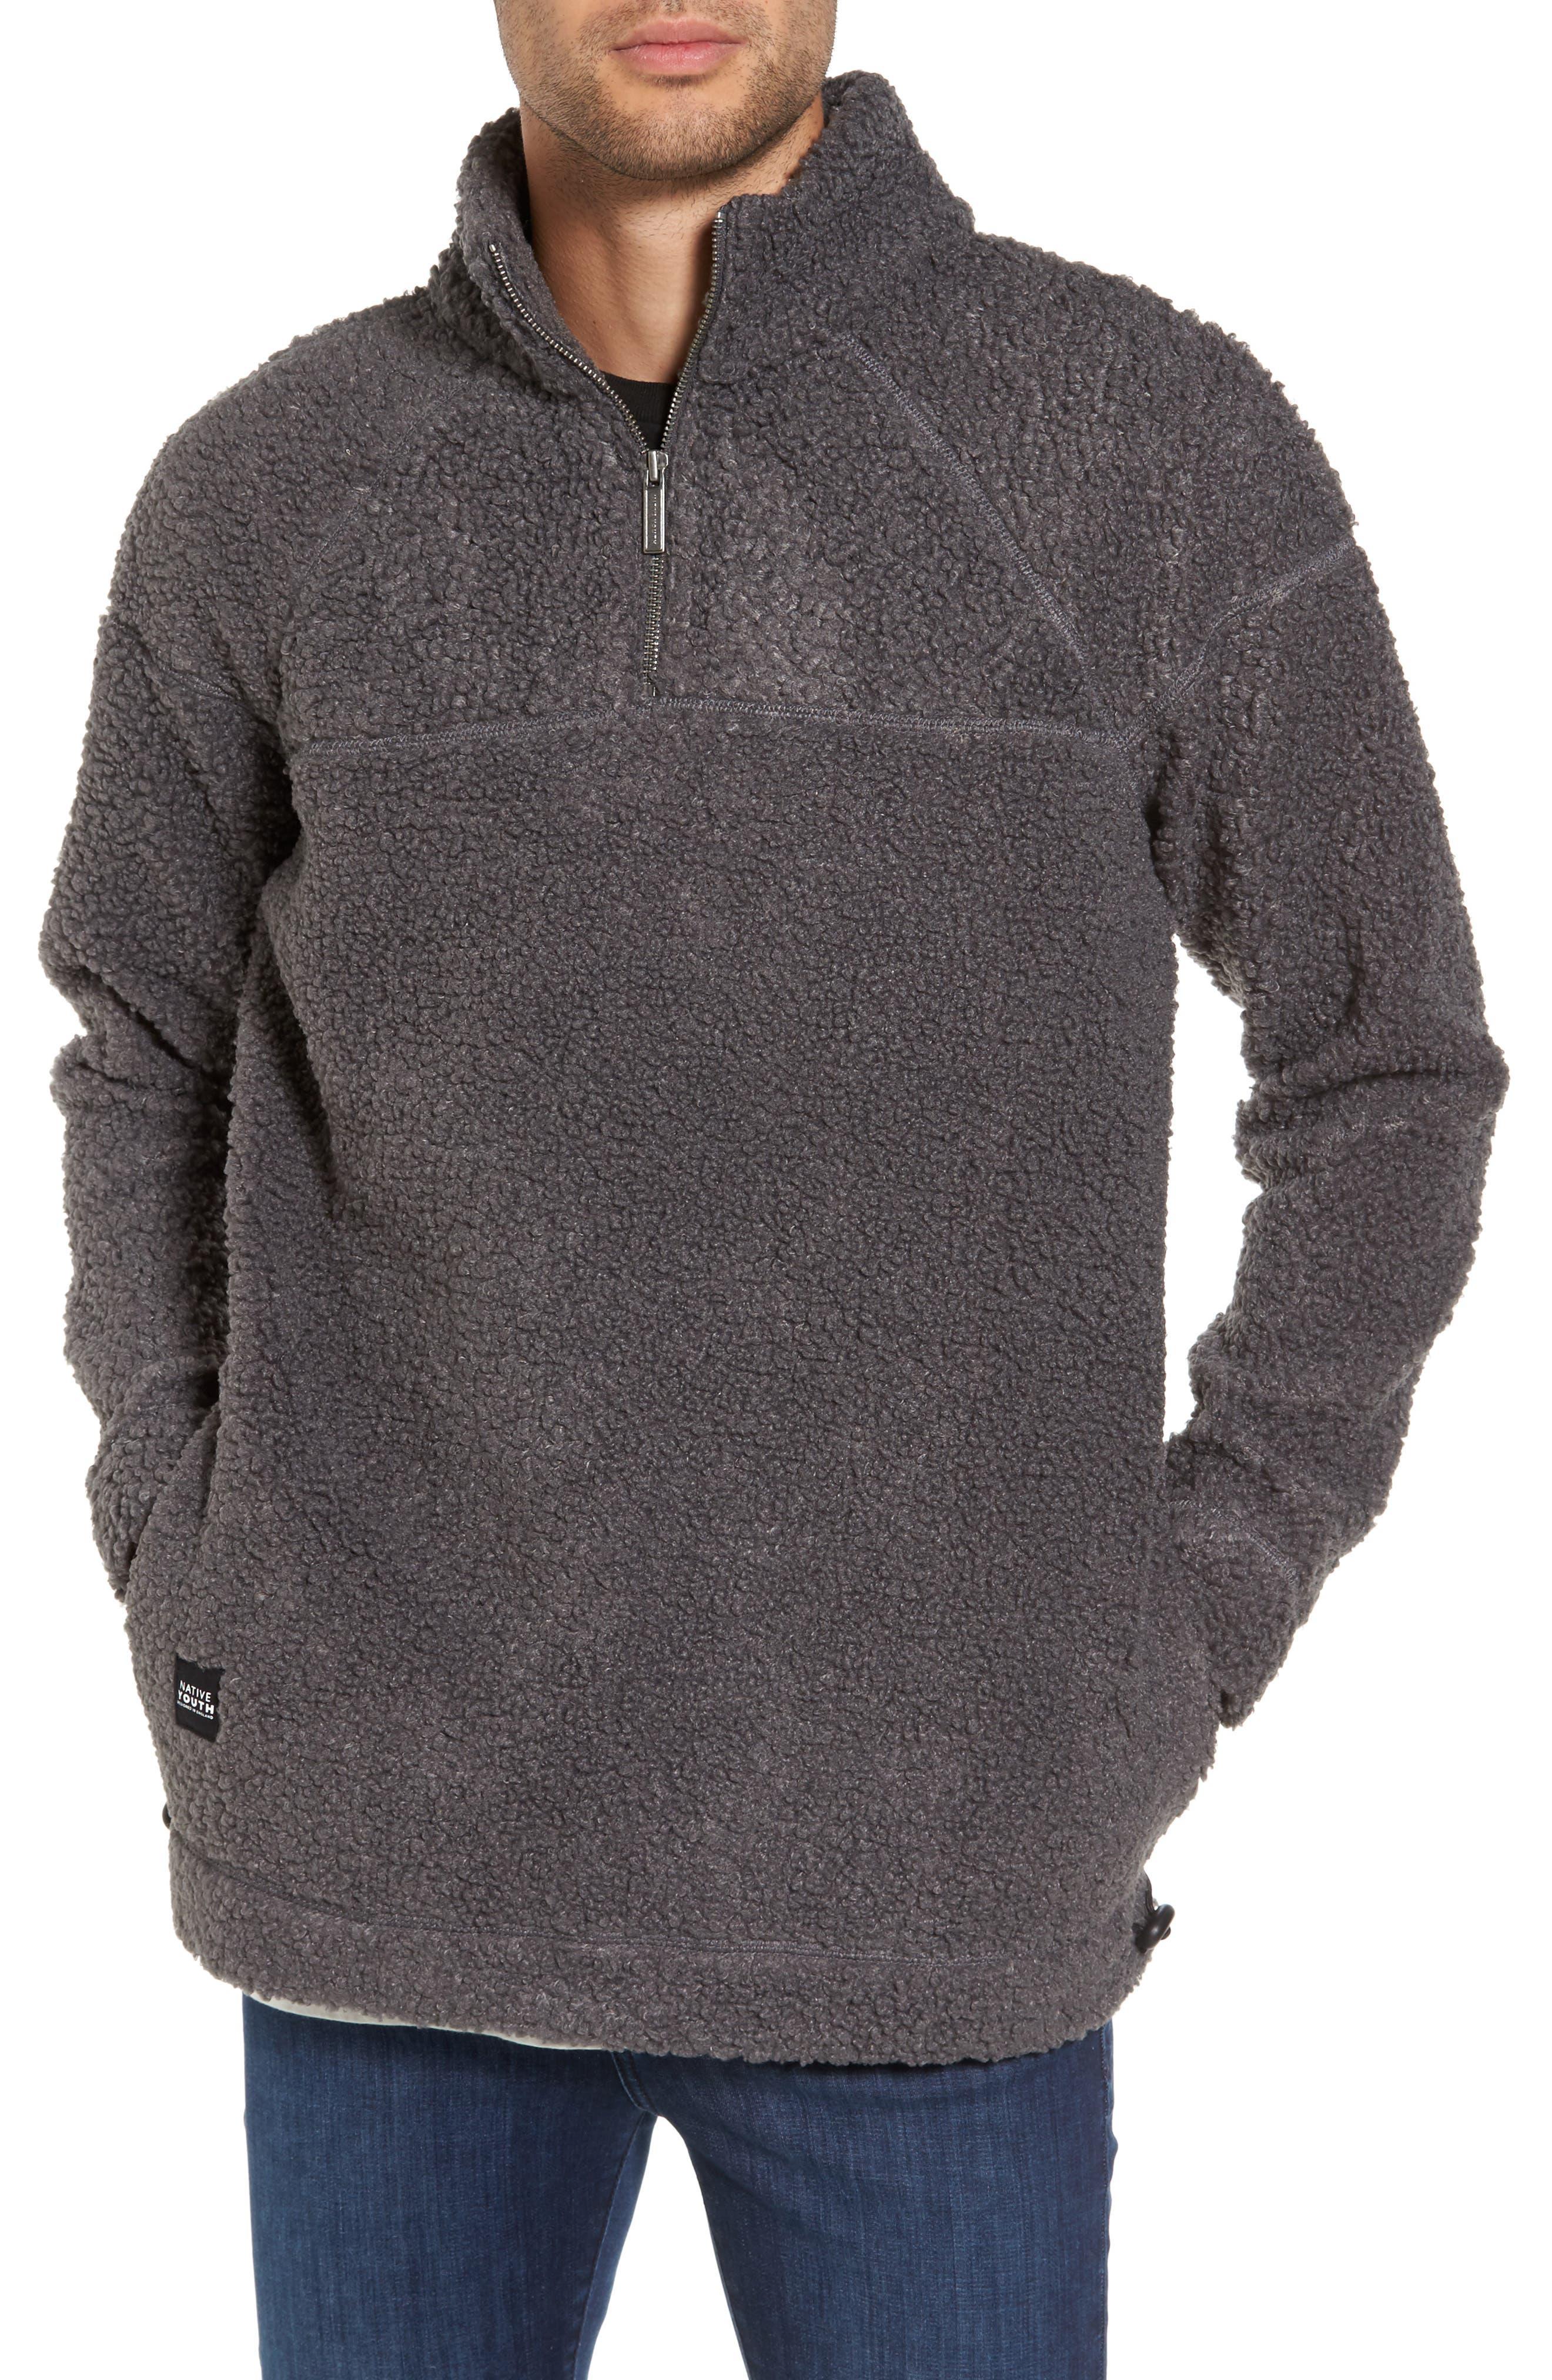 Warlock Faux Shearling Quarter Zip Sweater,                         Main,                         color,